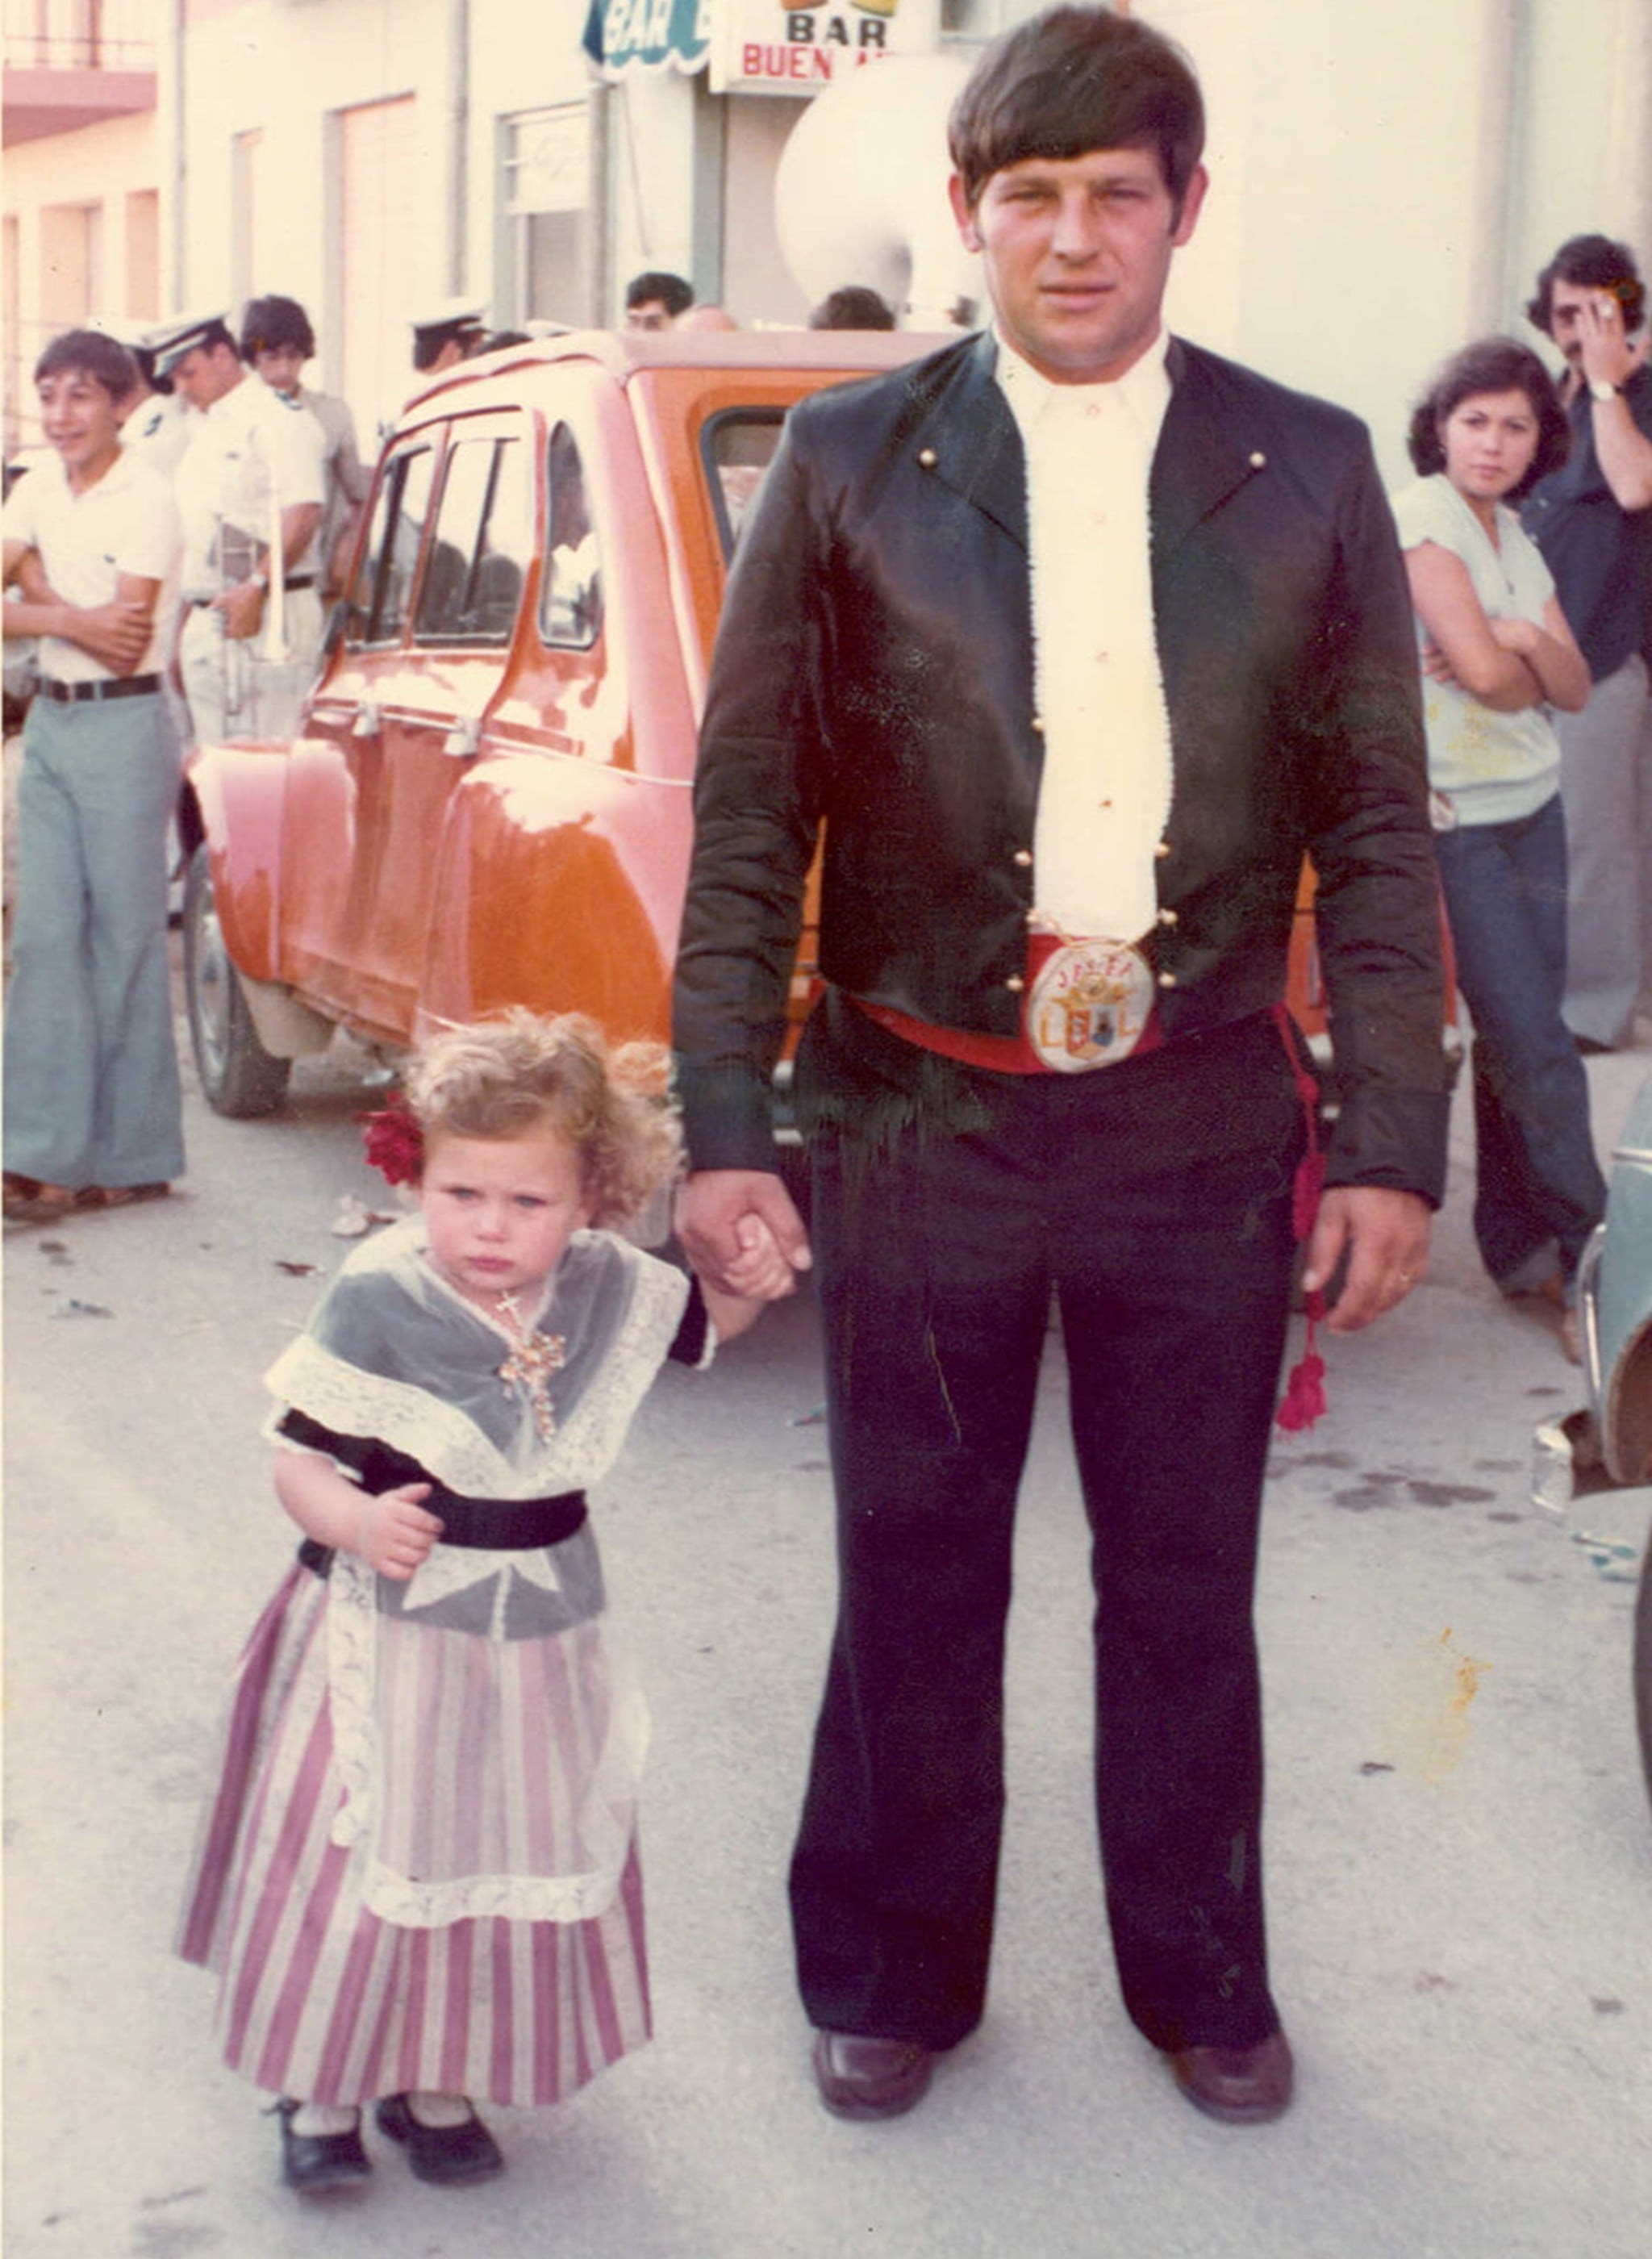 Juan Cholbi y MªJesús Cholbi en las fiestas de San Juan de Xàbia en los años 70